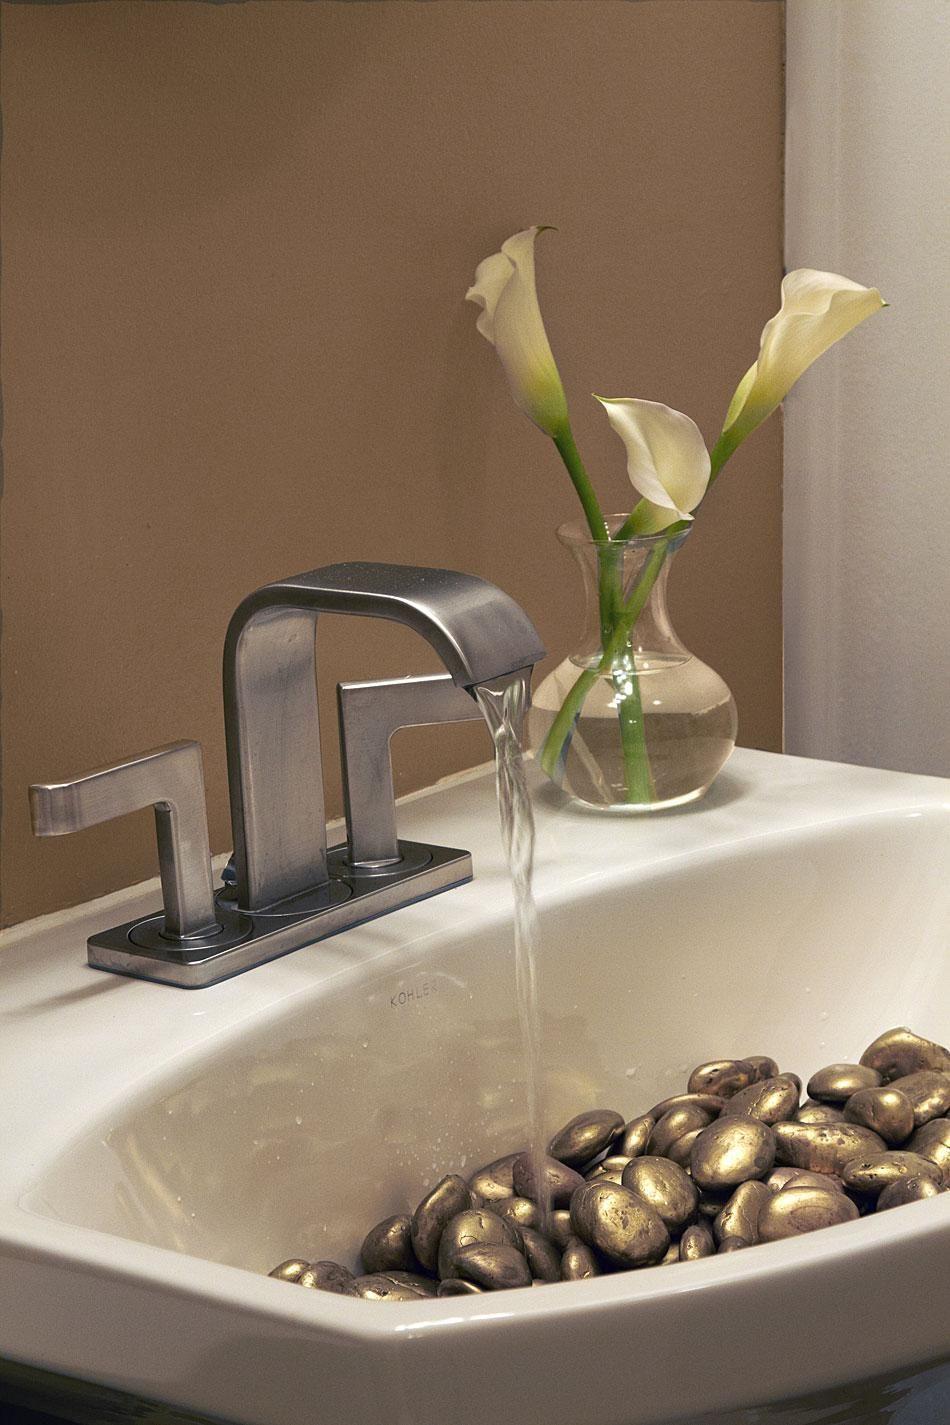 Noel NY Salon. This sink looks amazing !